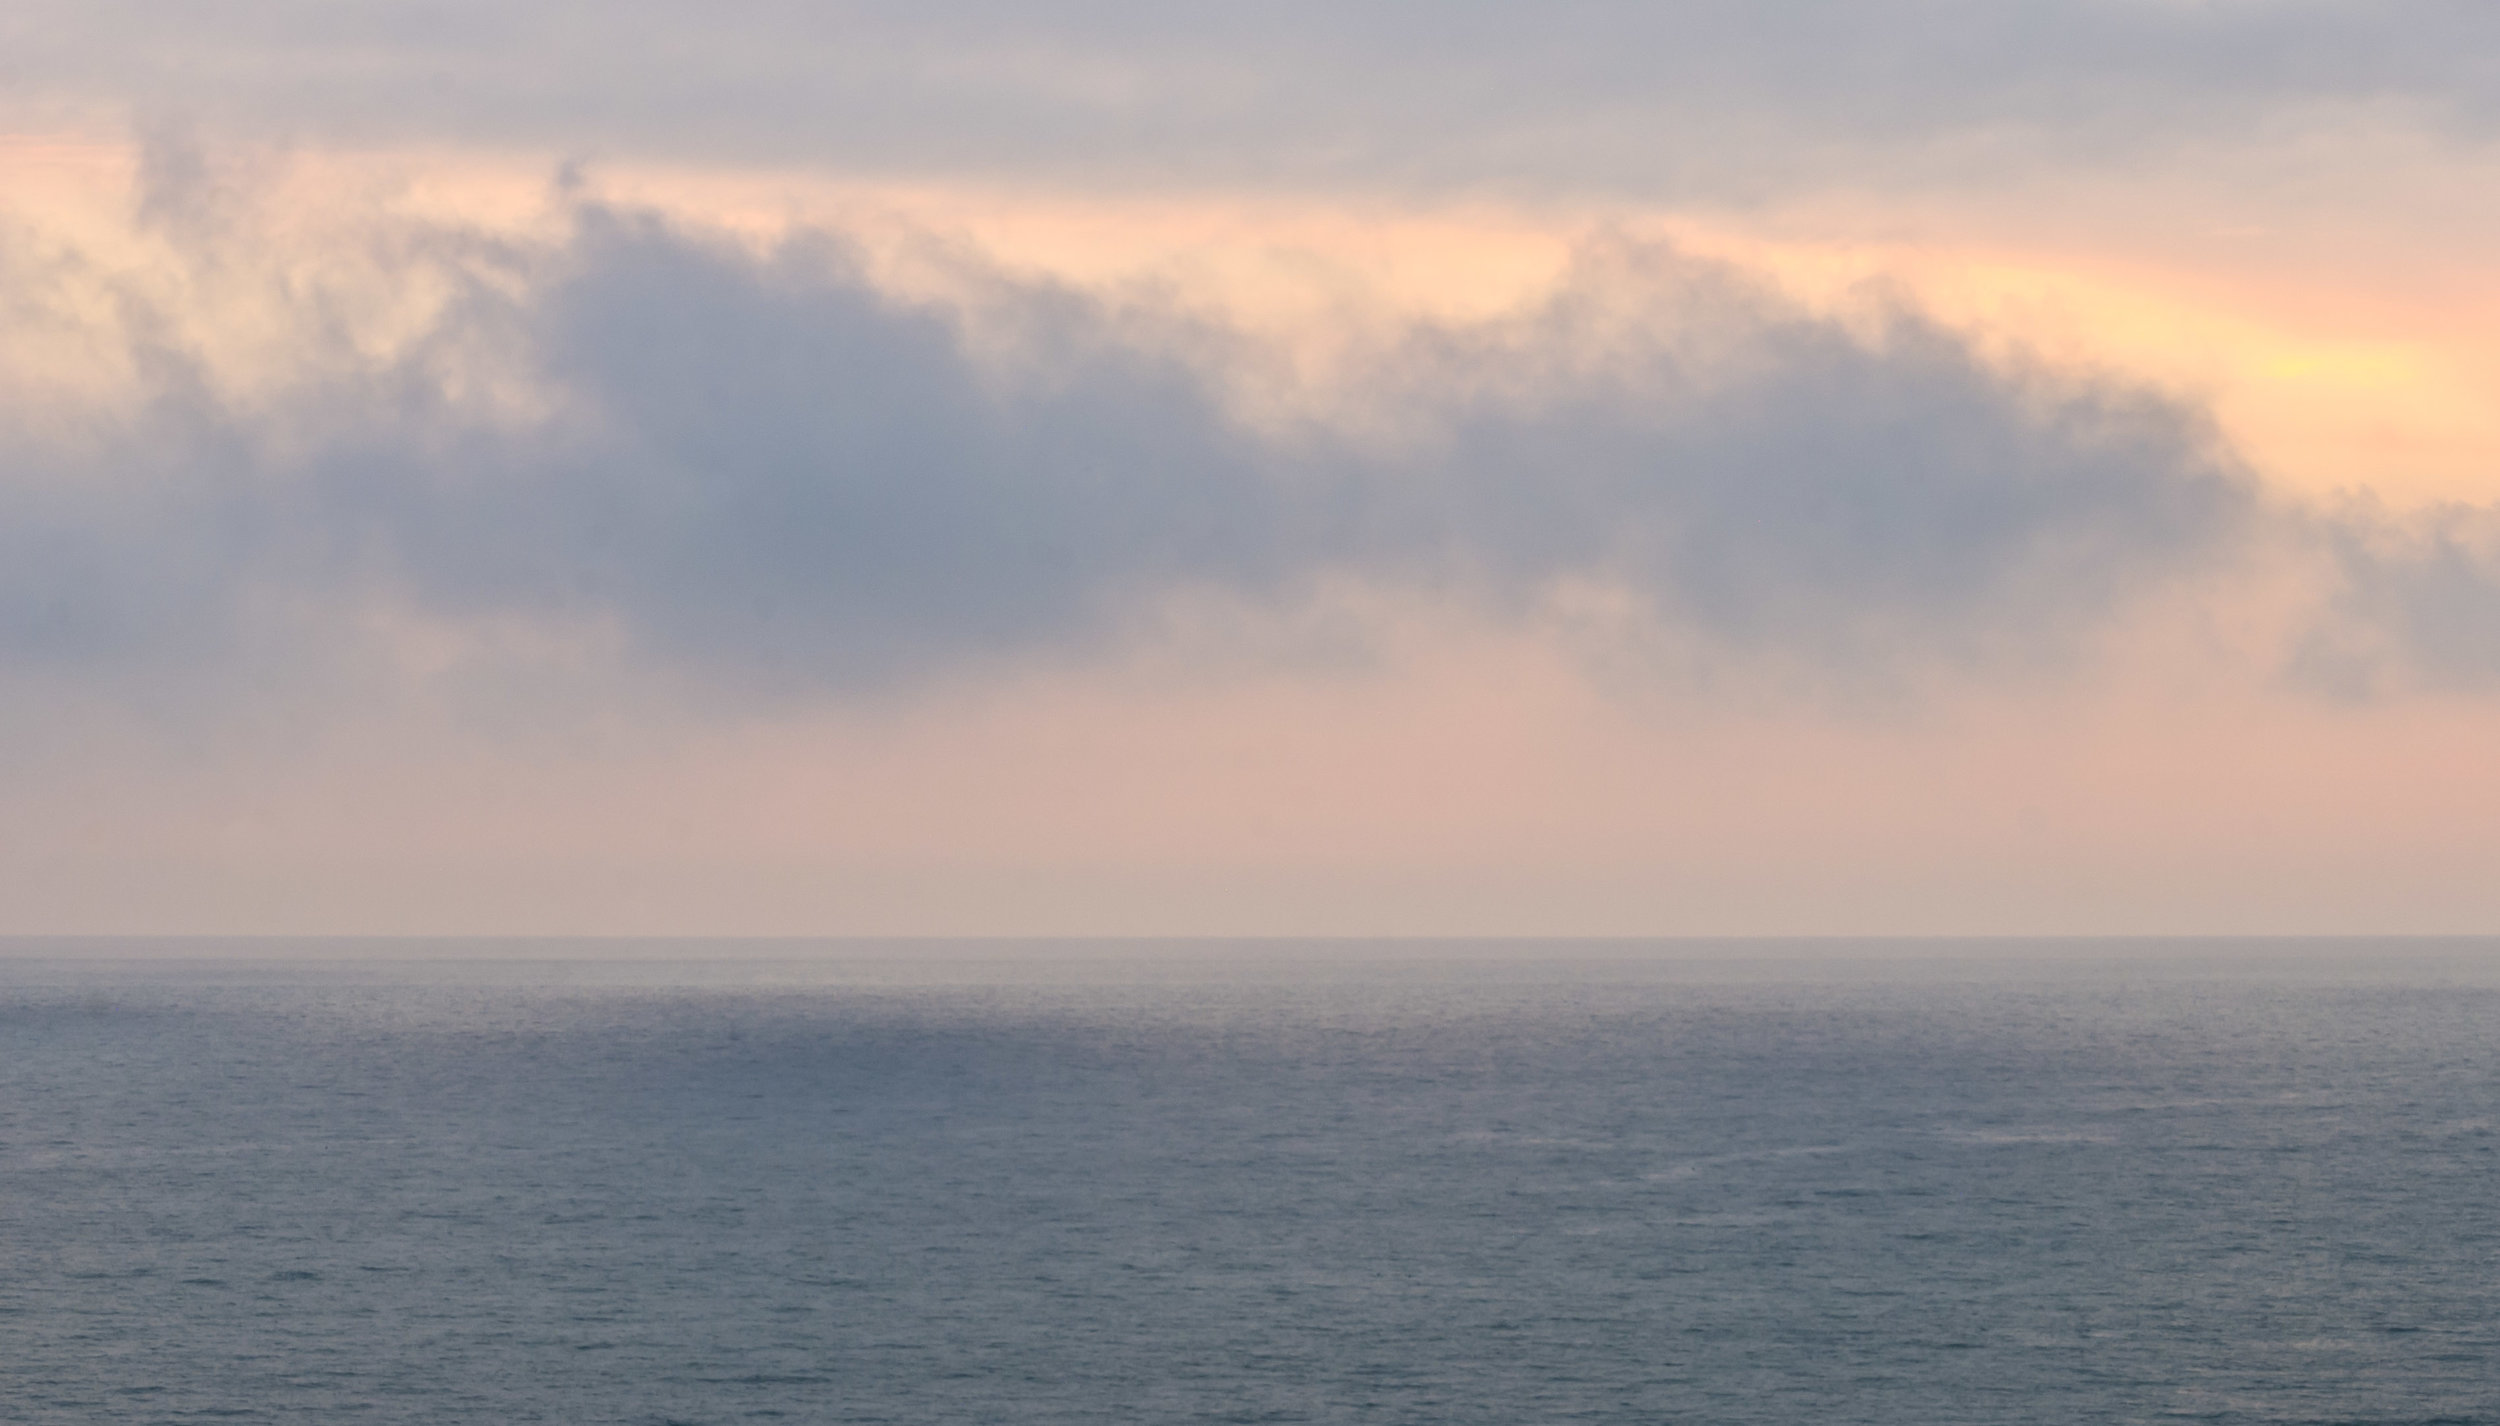 Sunset Clouds over Malibu